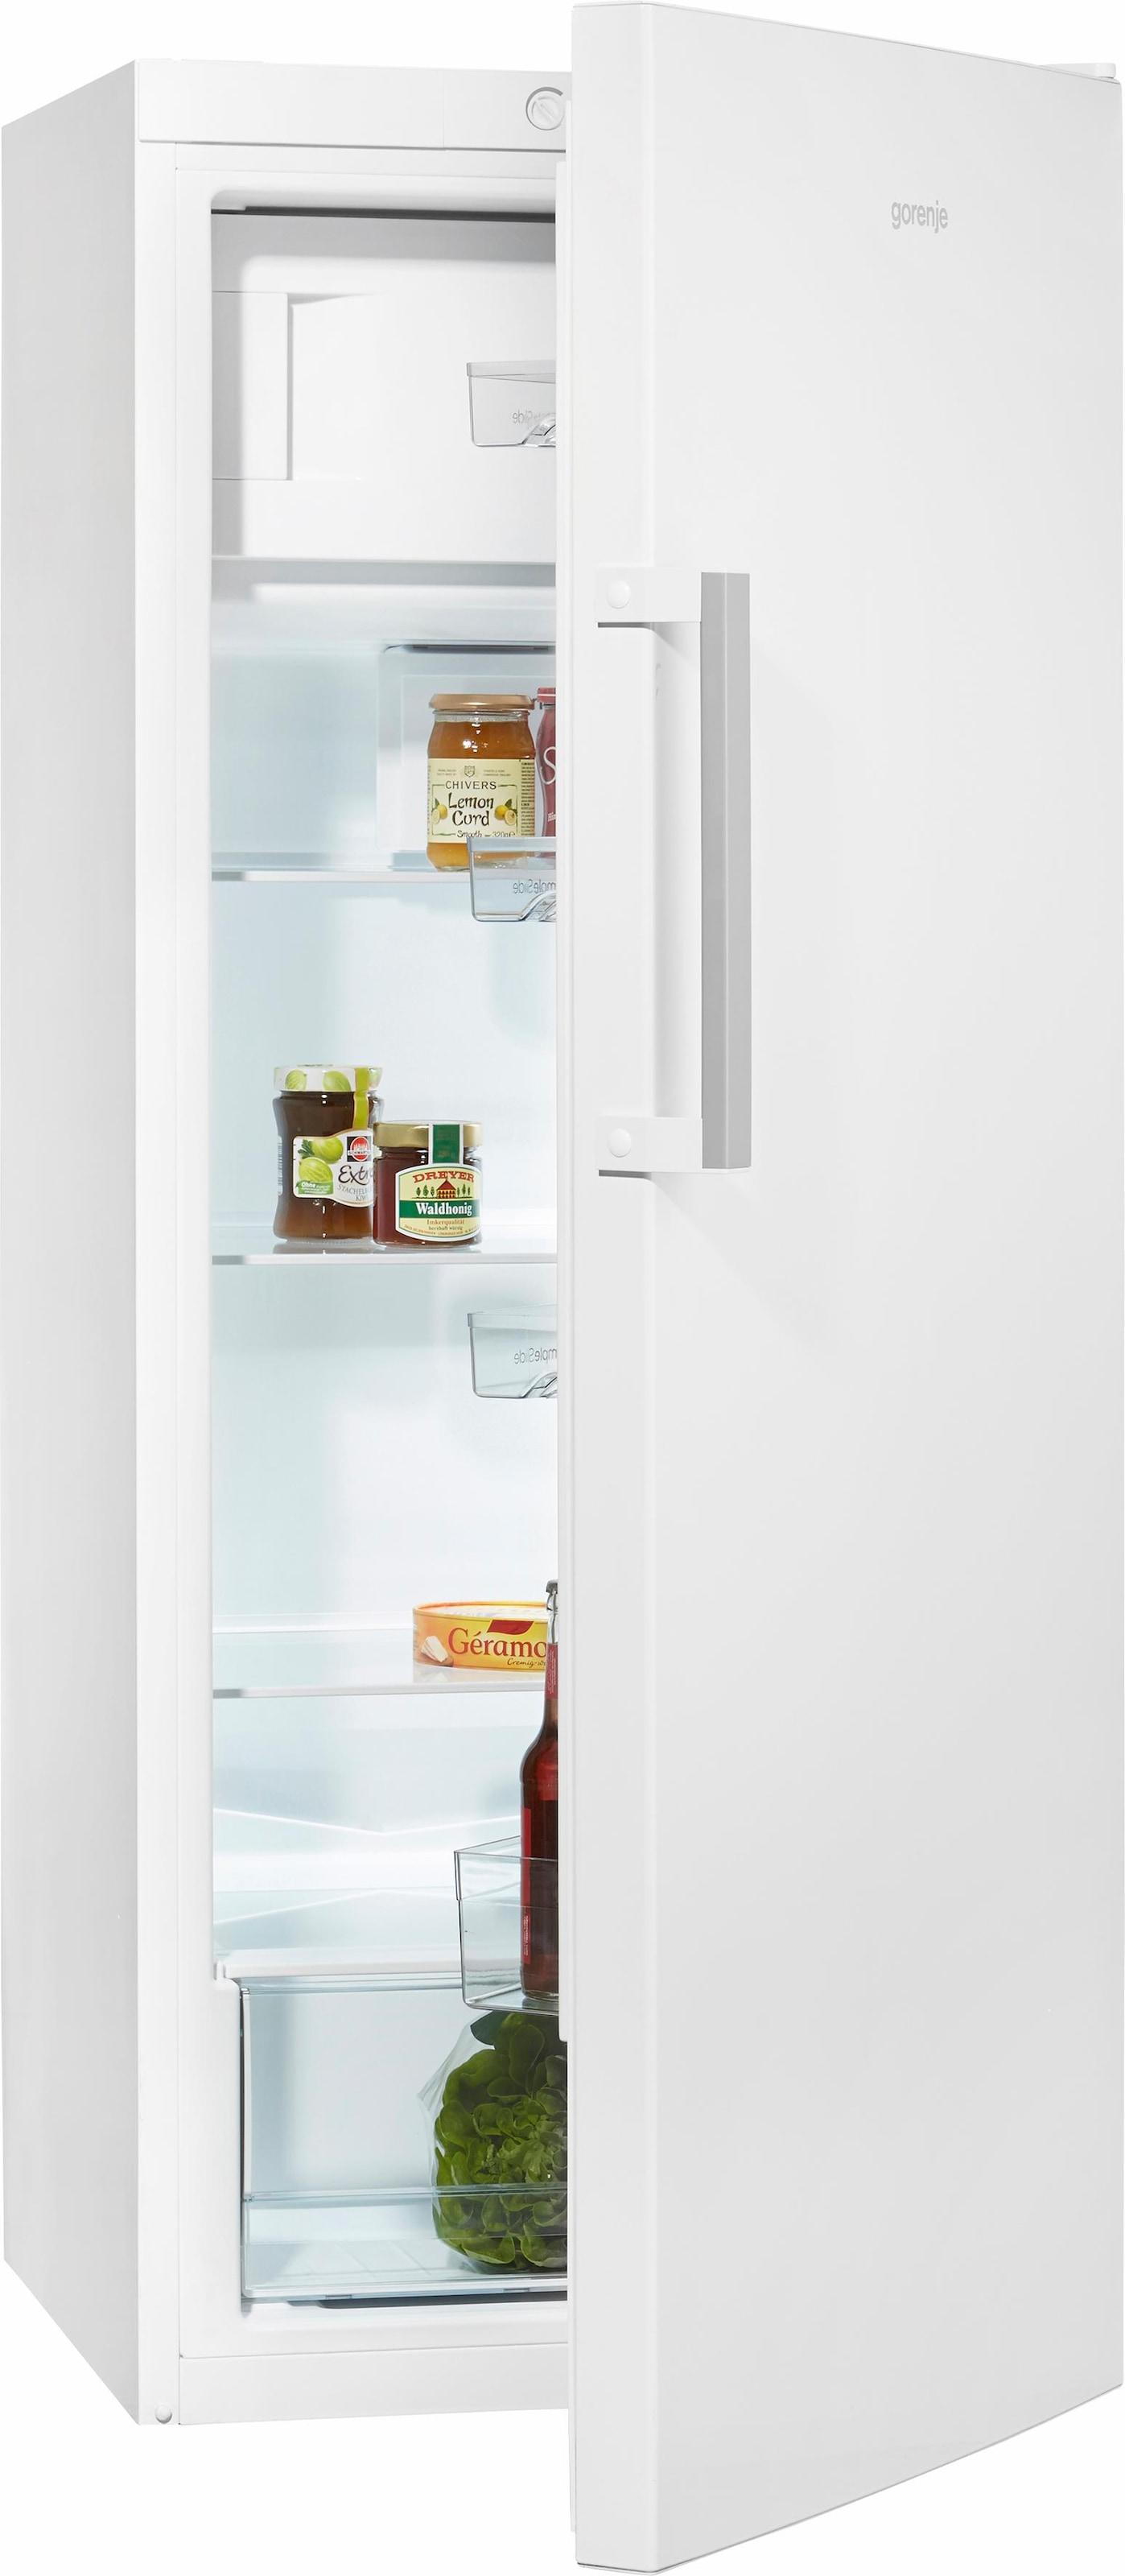 Gorenje Kühlschrank Retro Abtauen : Gorenje kühlschränke onlineshop gorenje kühlschränke online